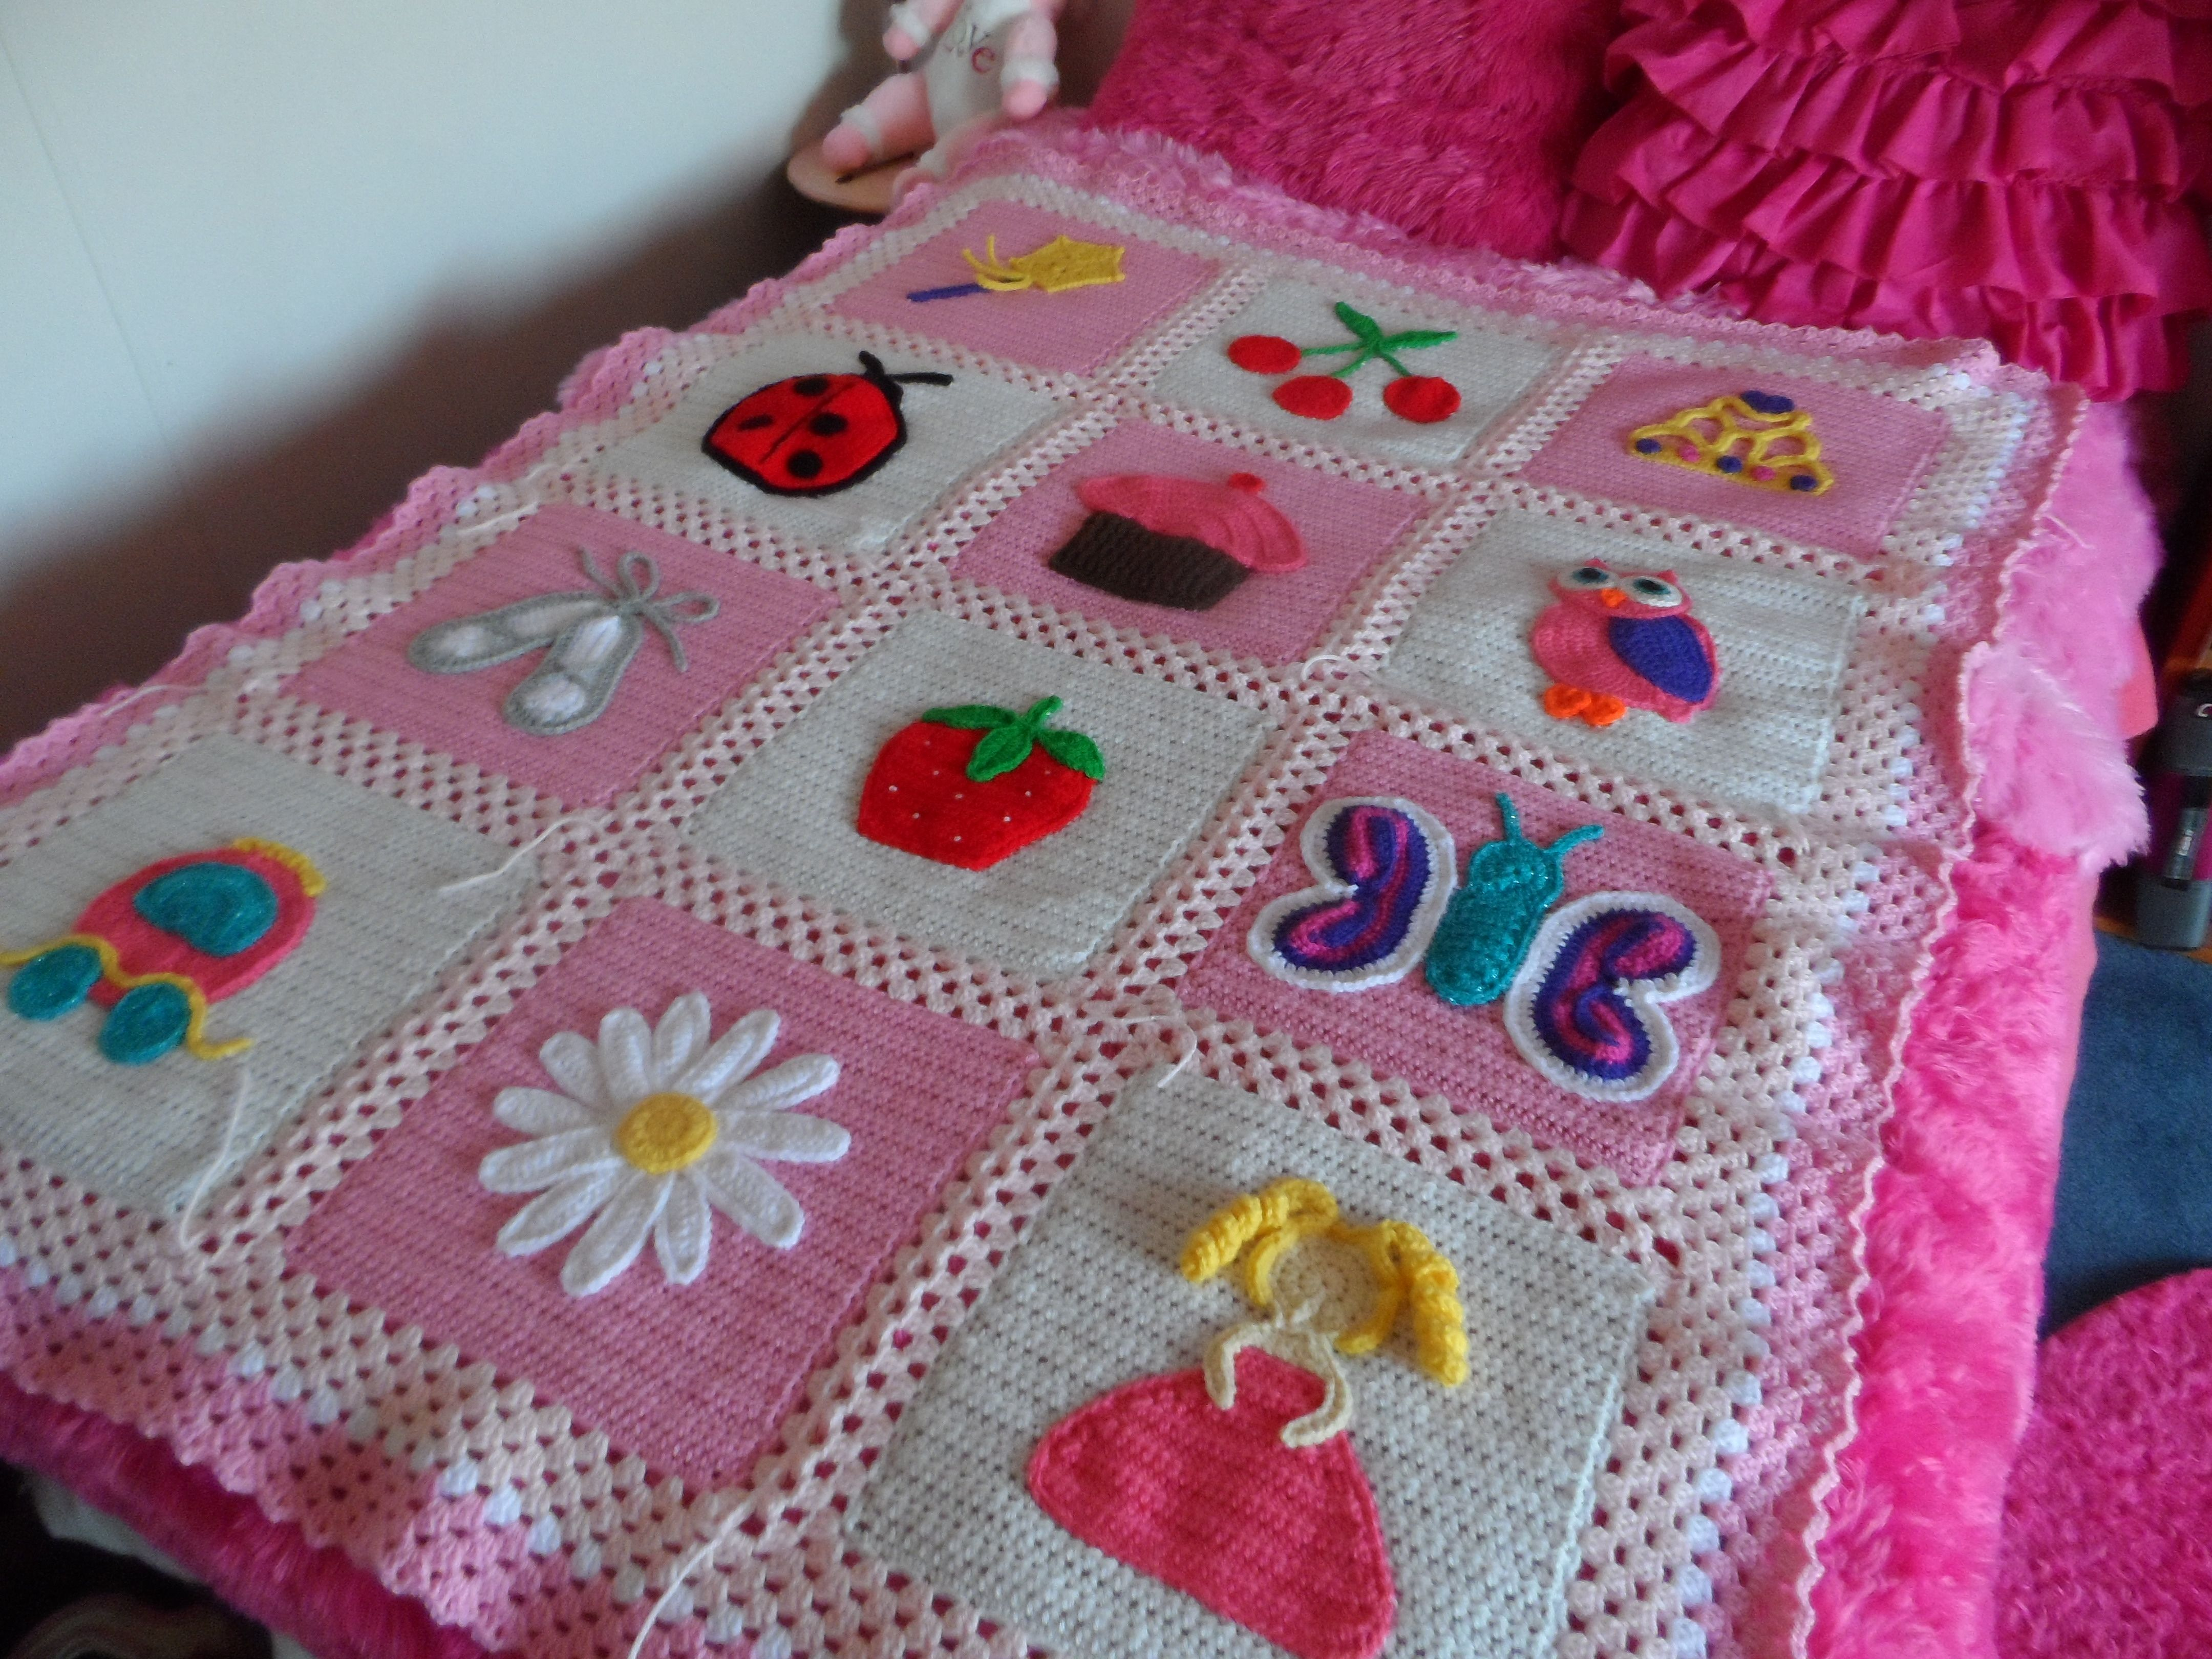 Little Blossom Blanket pattern by Knot Your Nana's Crochet